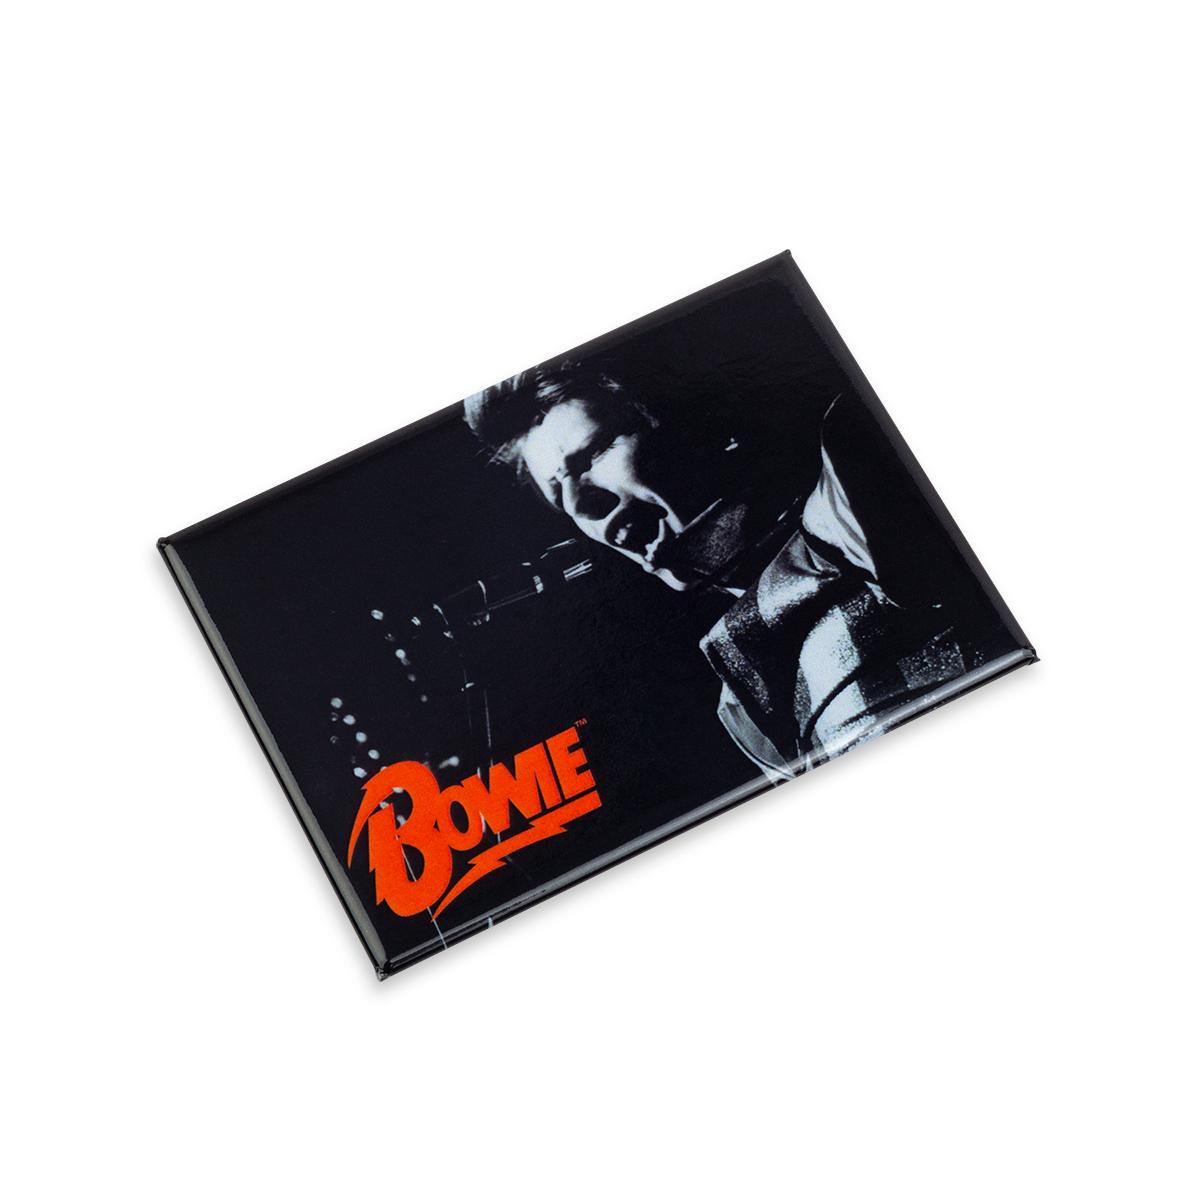 David Bowie B&W Sing Magnet